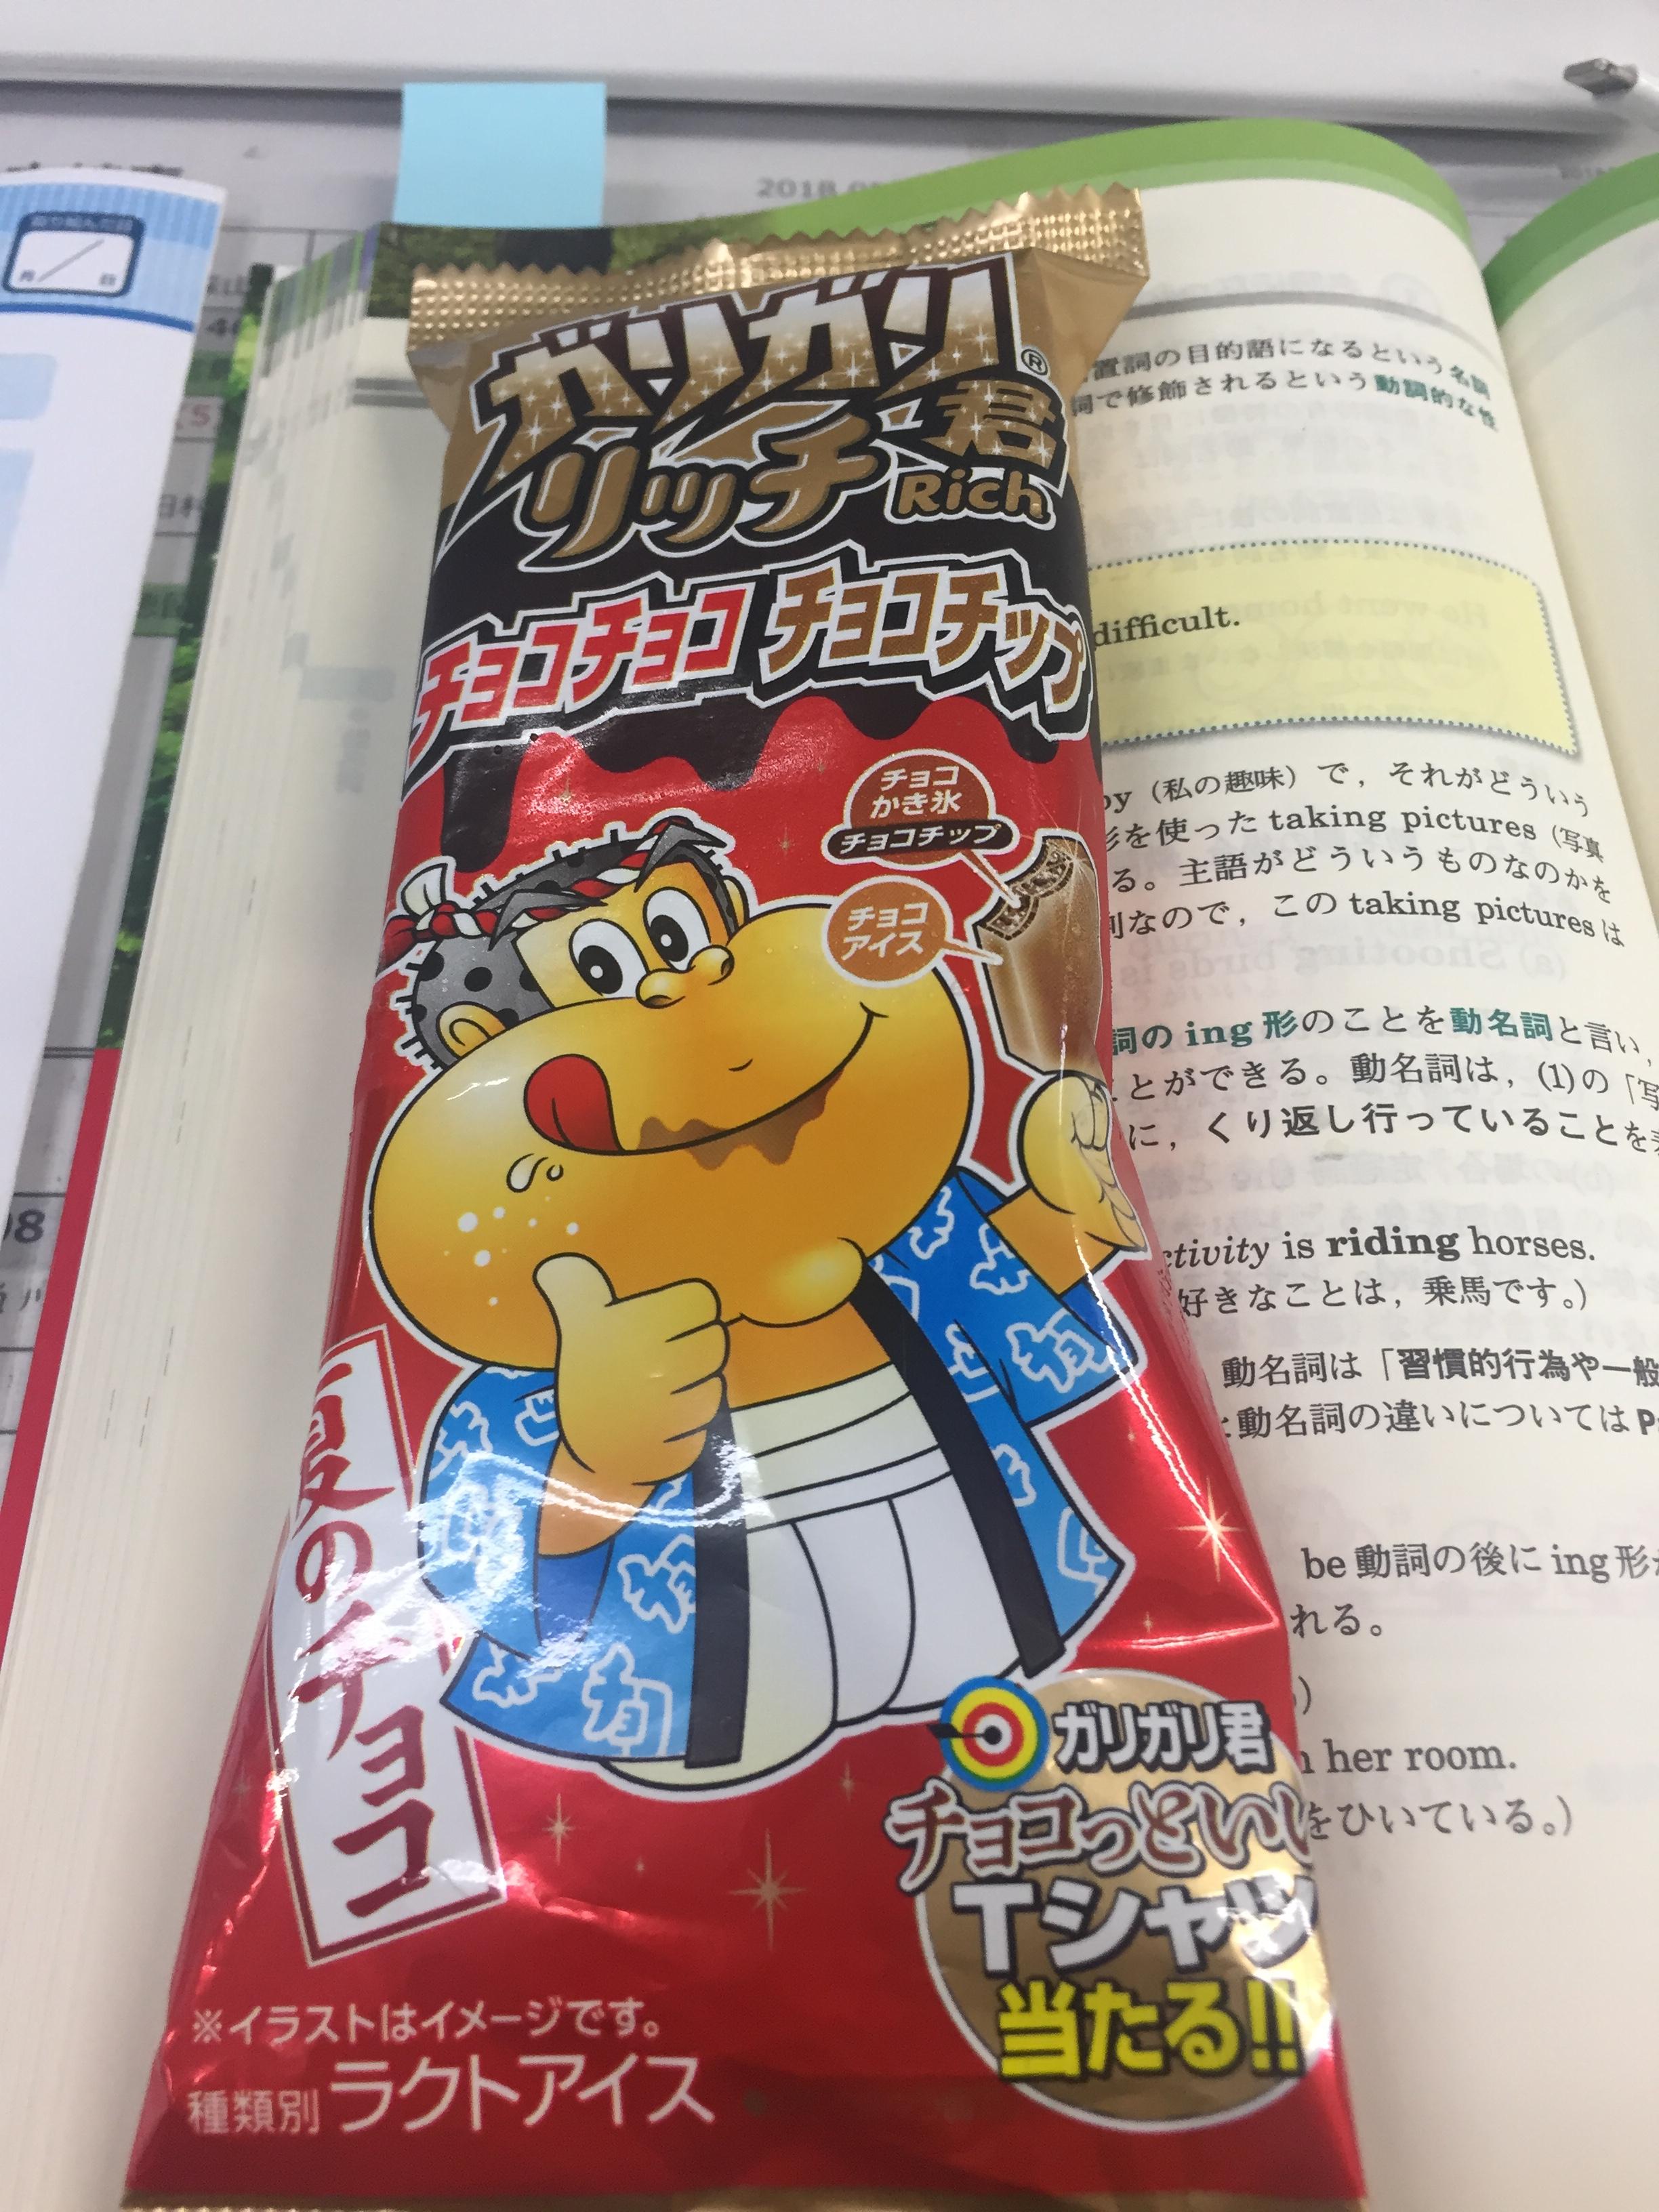 https://www.r-ac.jp/campus/osaka/blog/img/002.JPG